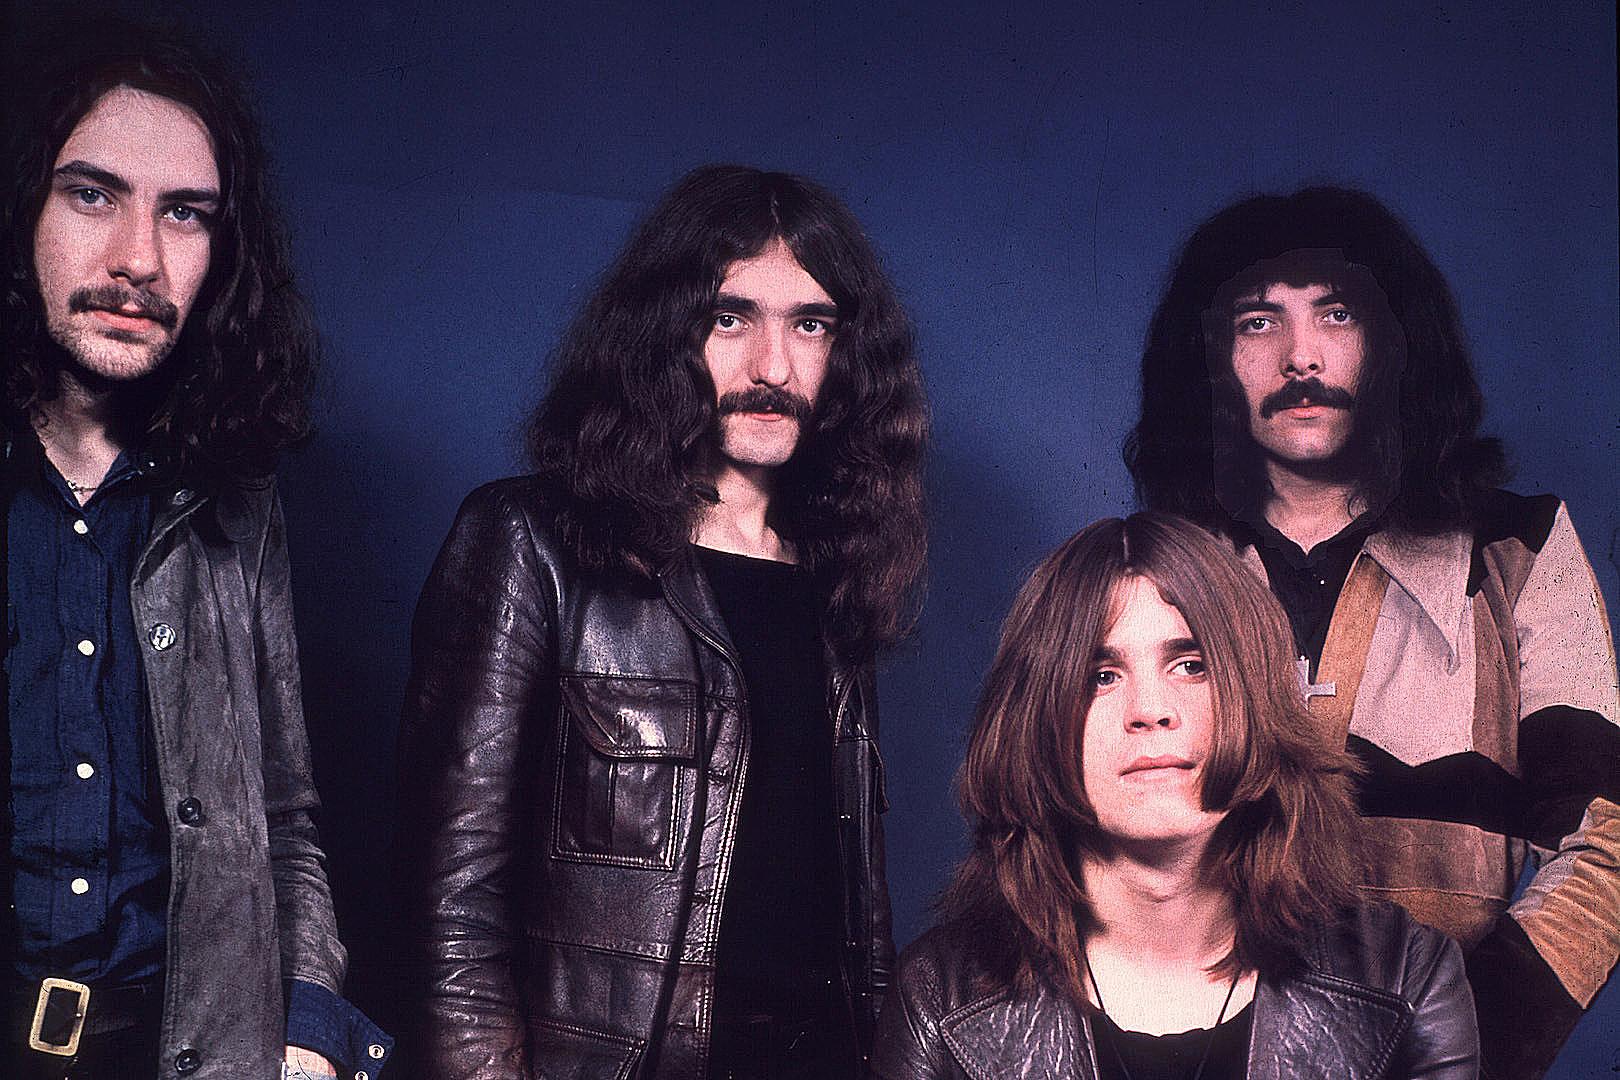 Black Sabbath's 'Vol. 4' to Receive 'Super Deluxe' Reissue